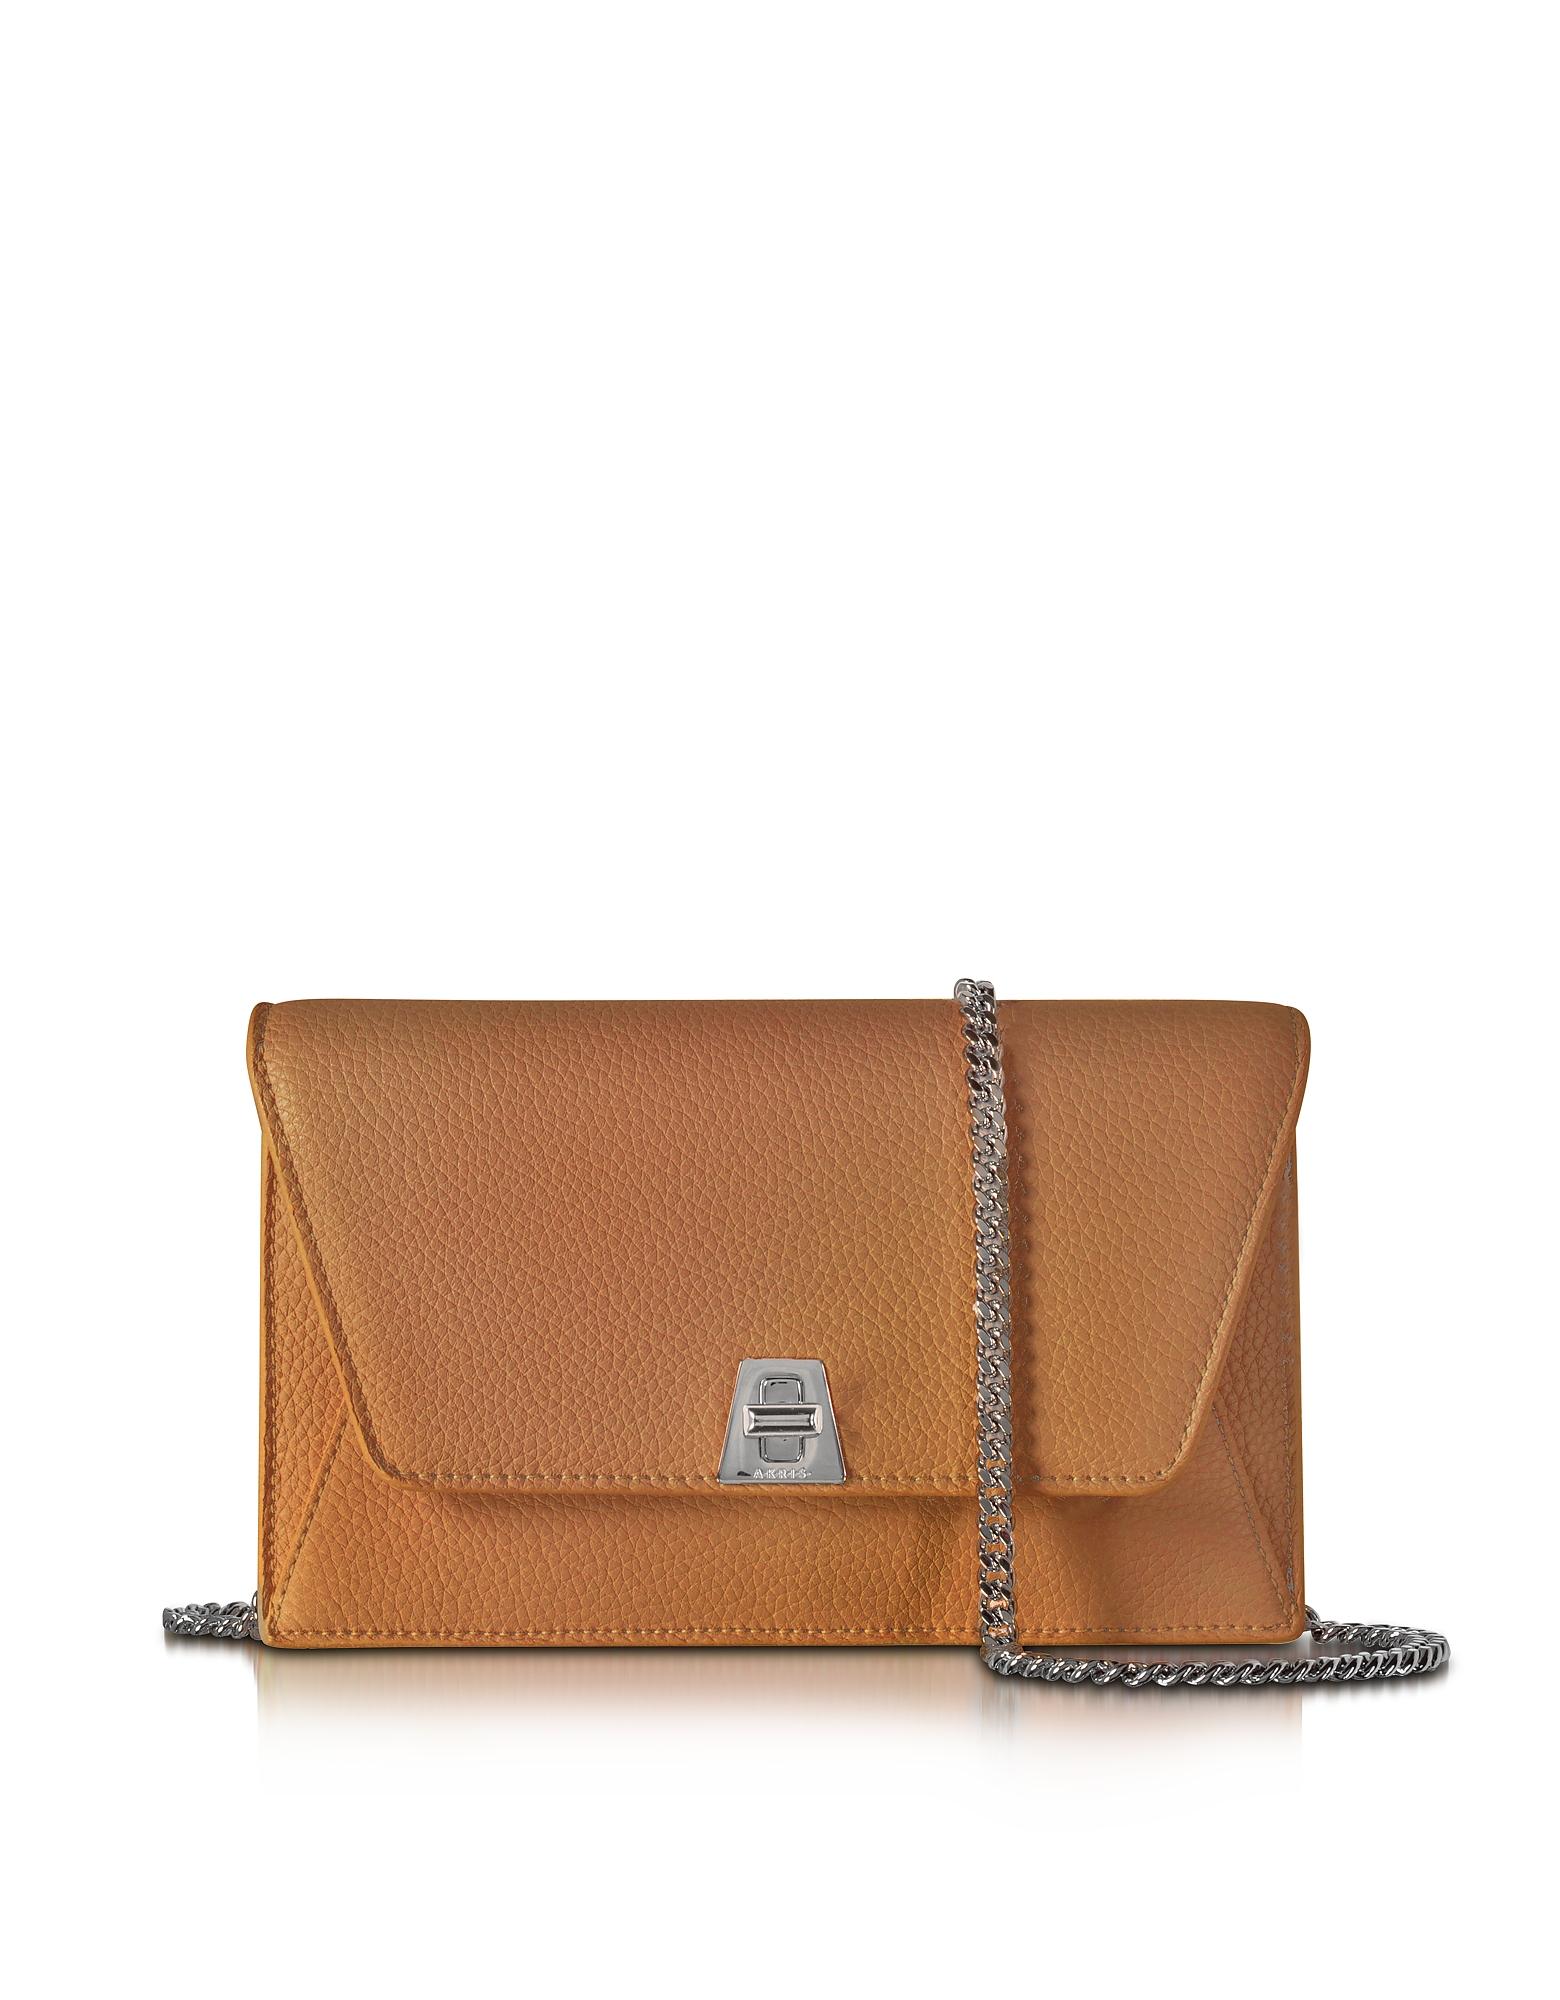 Akris Handbags, Anouk Cuoio Pebbled Leather Clutch w/Chain